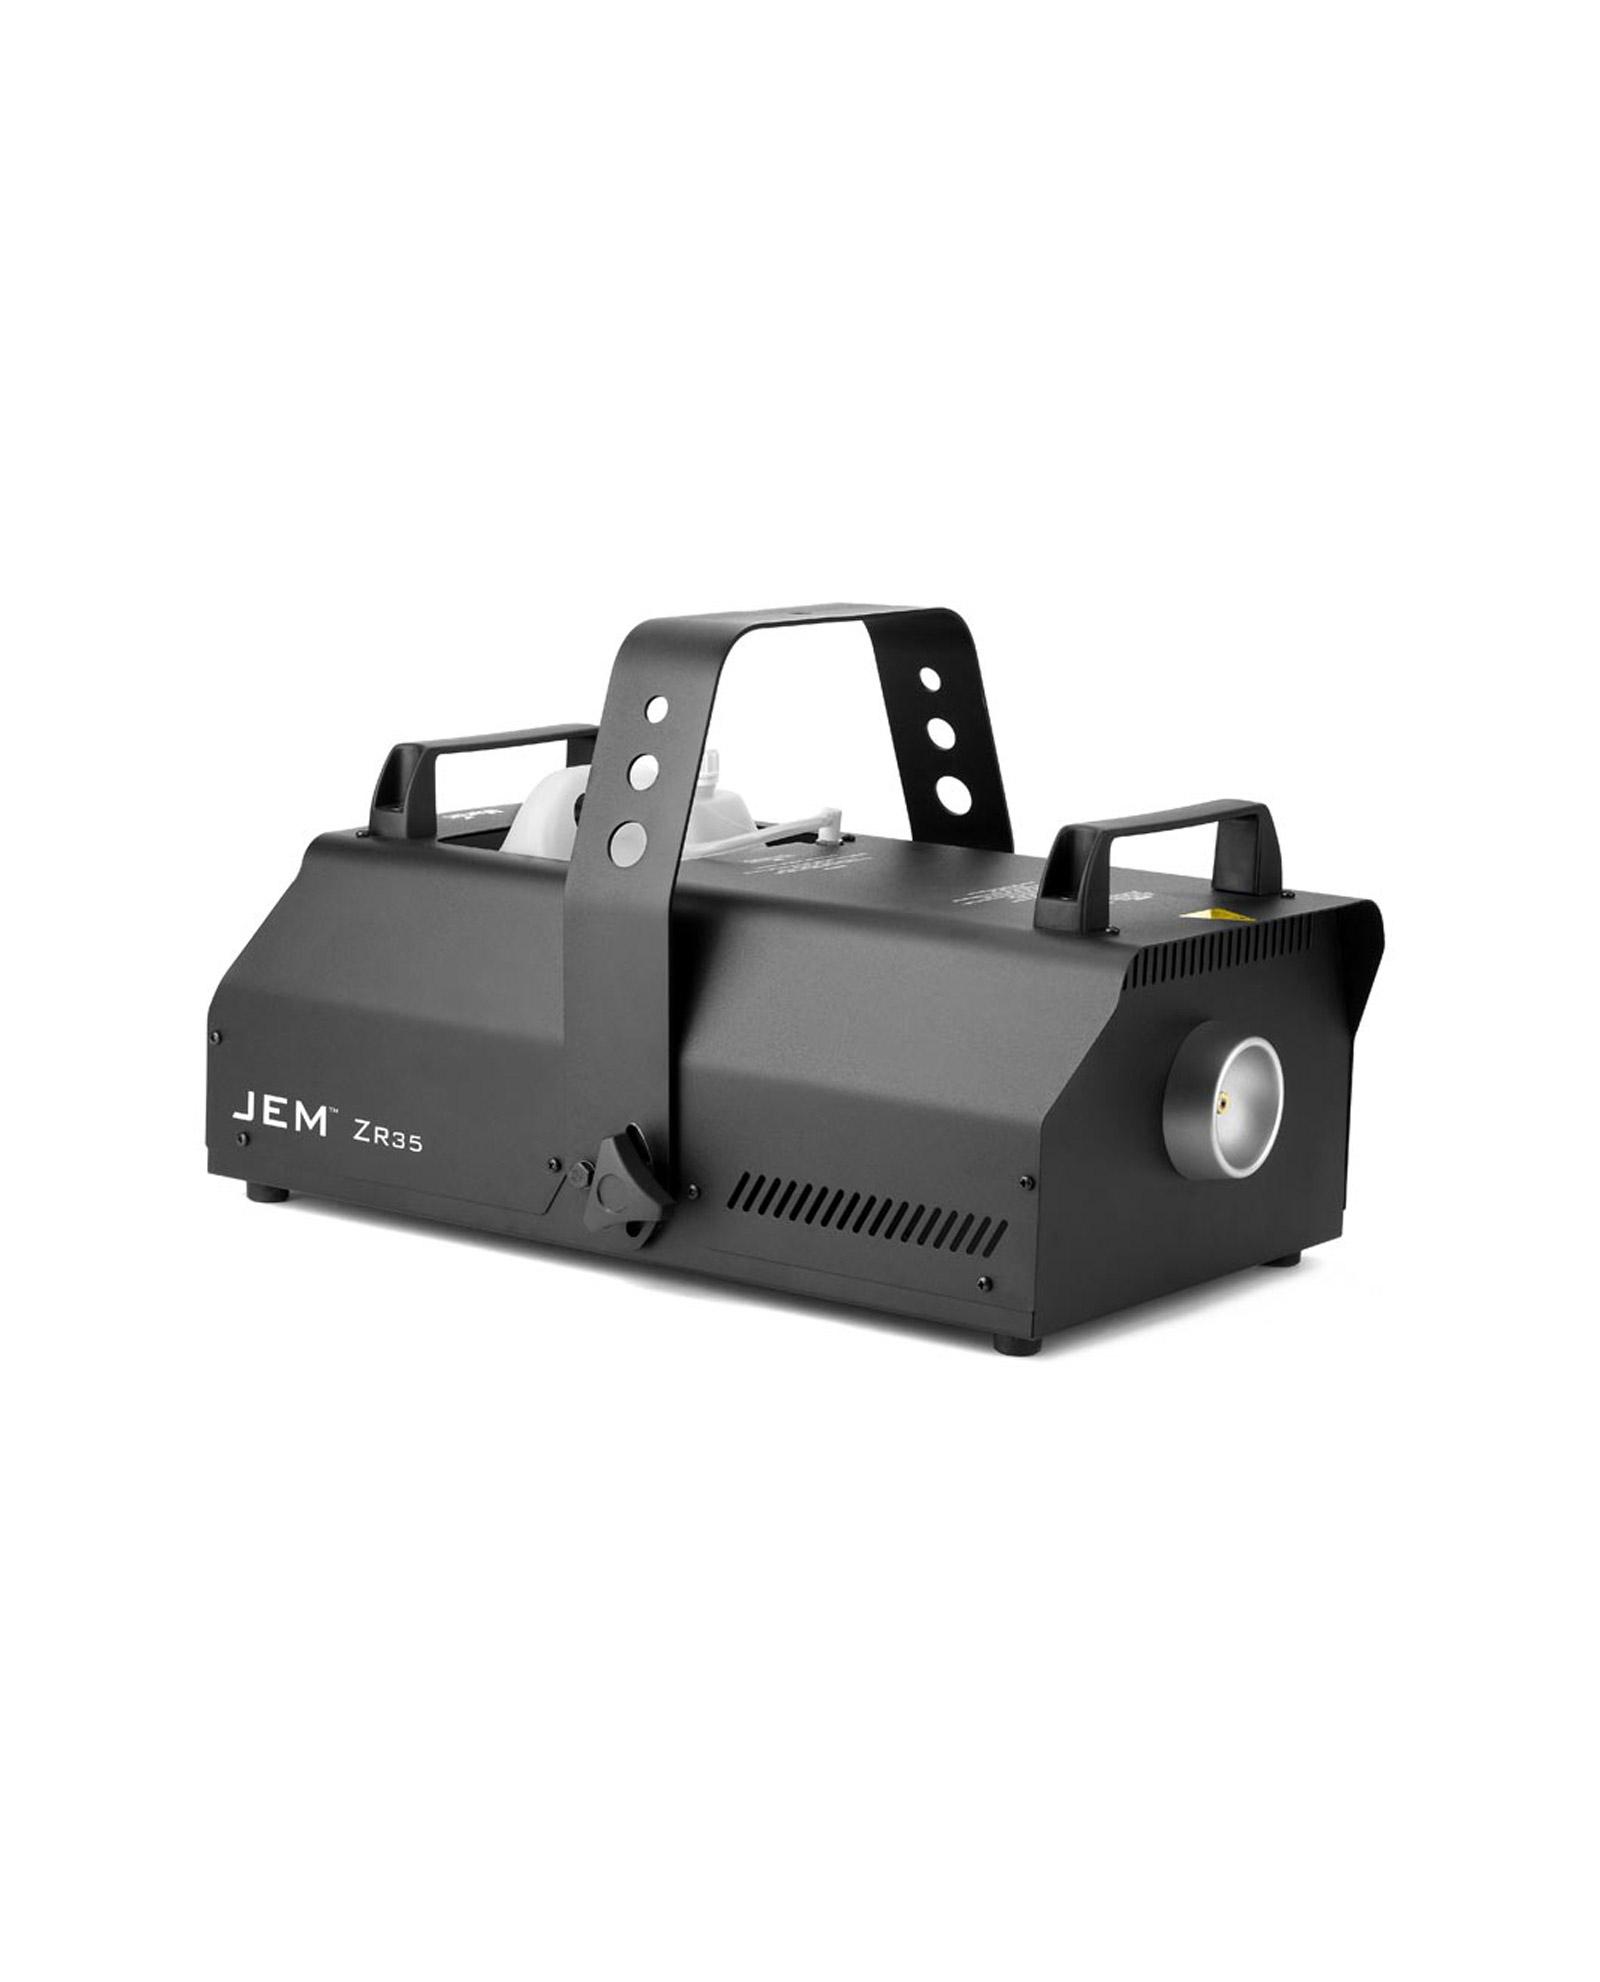 Jem Zr35 Fog Machine